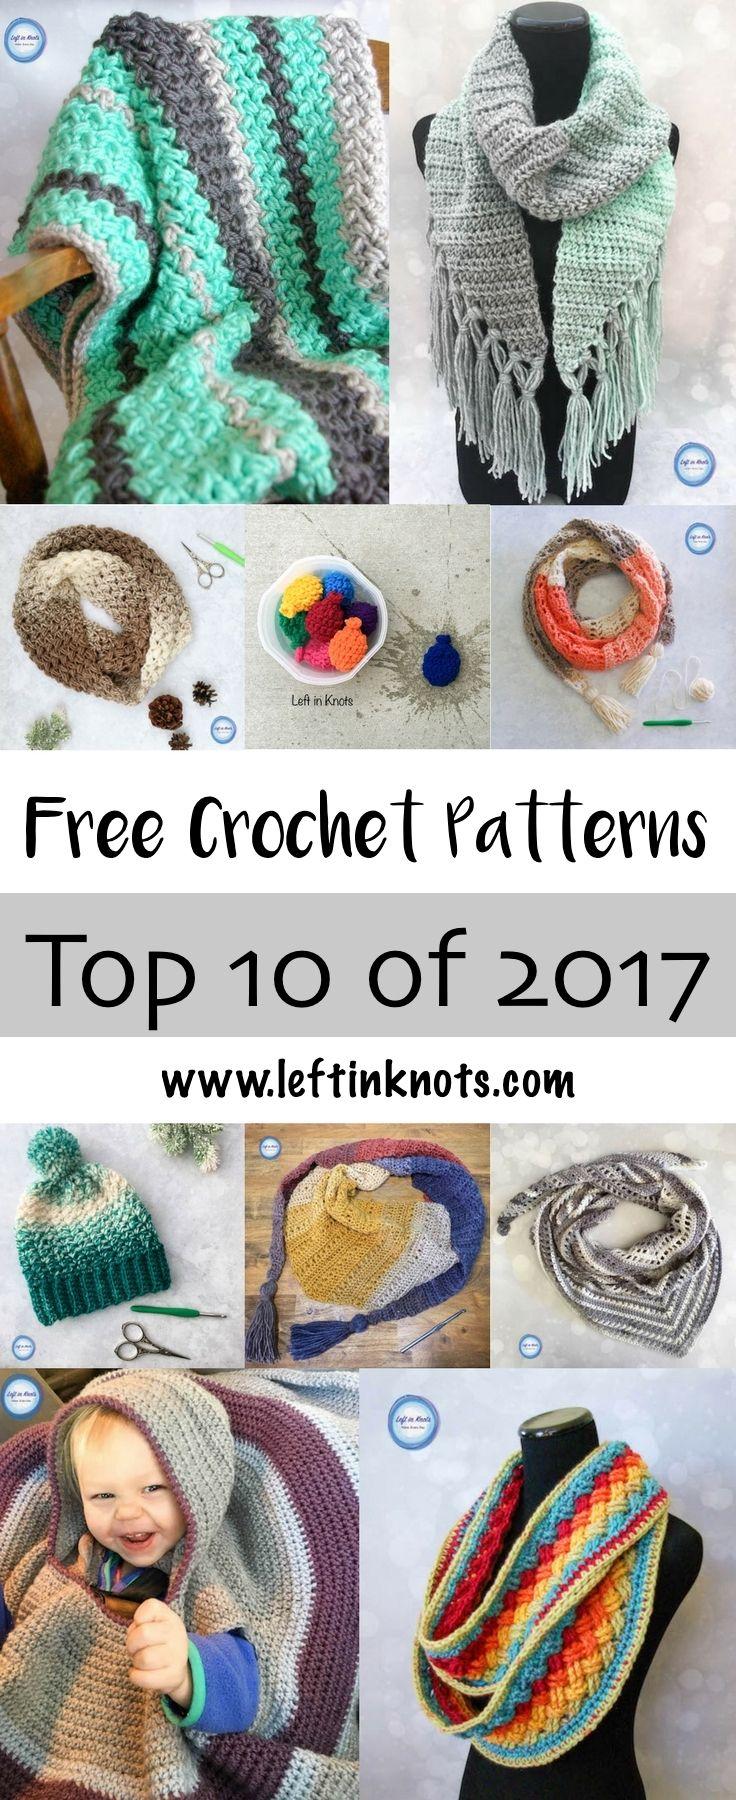 Top 10 Free Crochet Patterns of 2017 | Patrones blusas, Bufanda ...